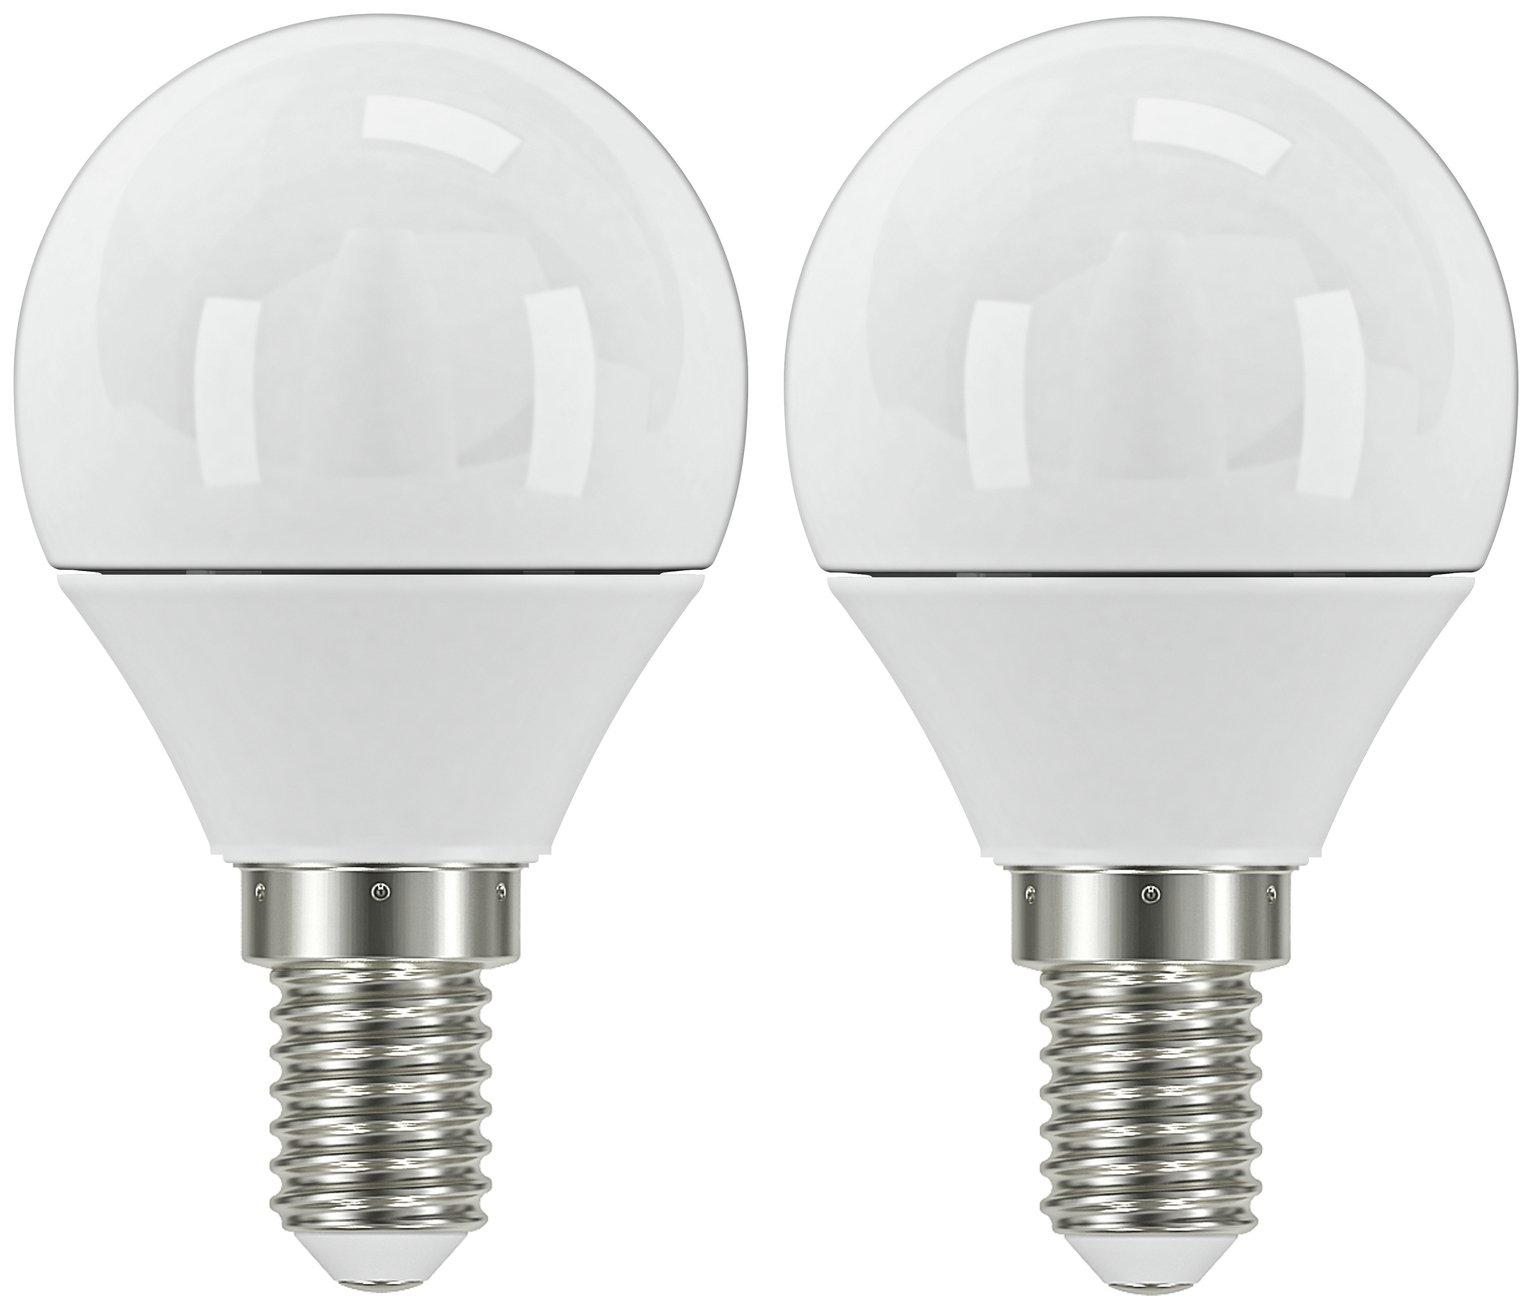 Argos Home 3W LED Mini Globe SES Light Bulb - 2 Pack